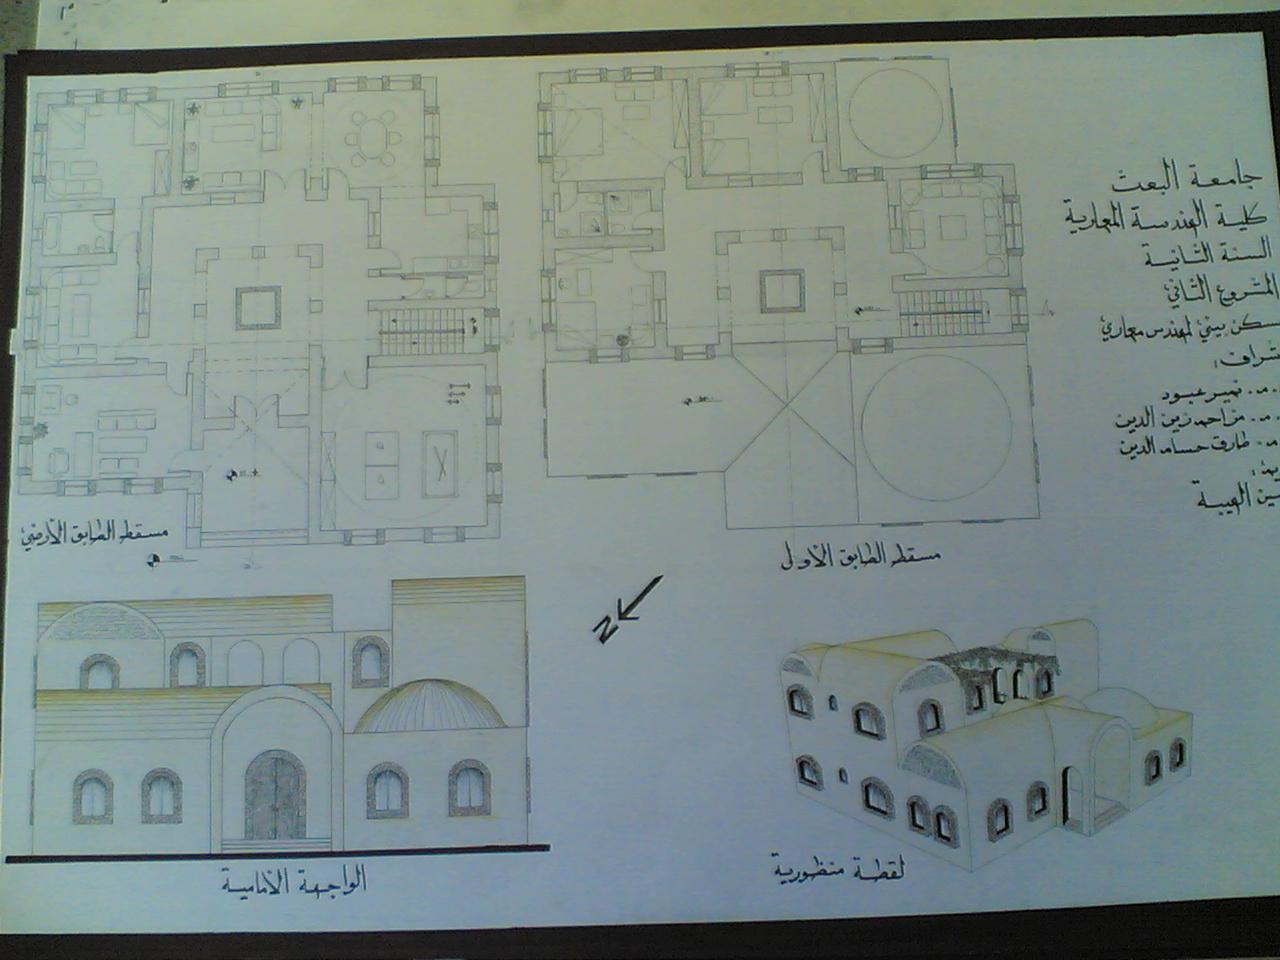 Arabic Traditional House Housin Alhibah Inect. Arabic Traditional House. Wiring. A Diagram Of A House Arabic At Scoala.co